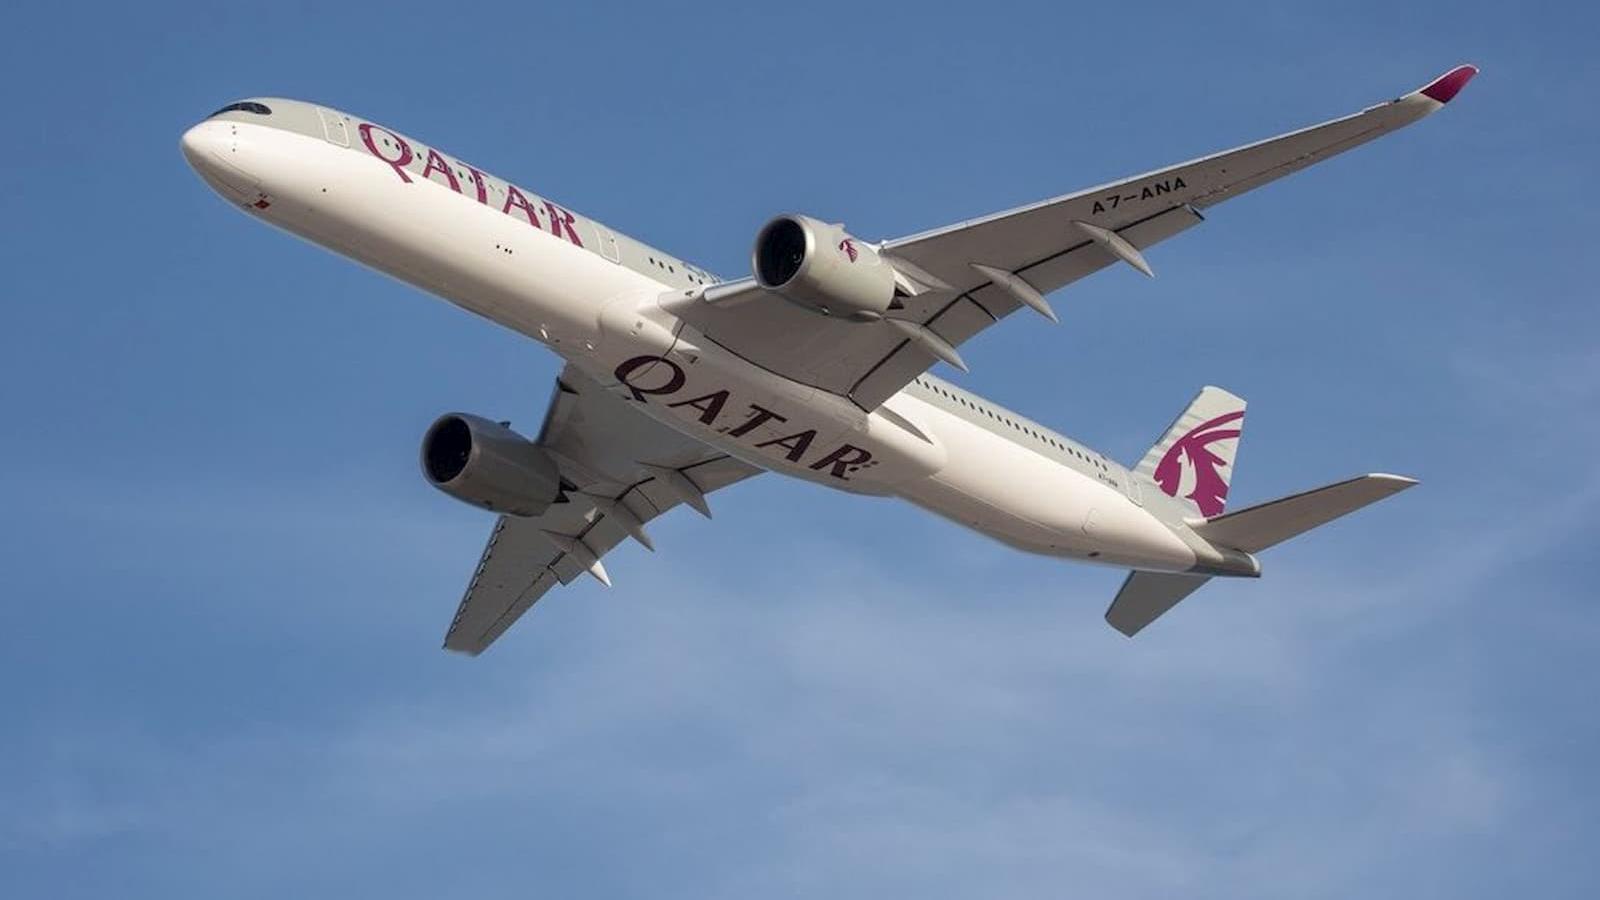 Qatar Airways to resume flights to UAE from January 27